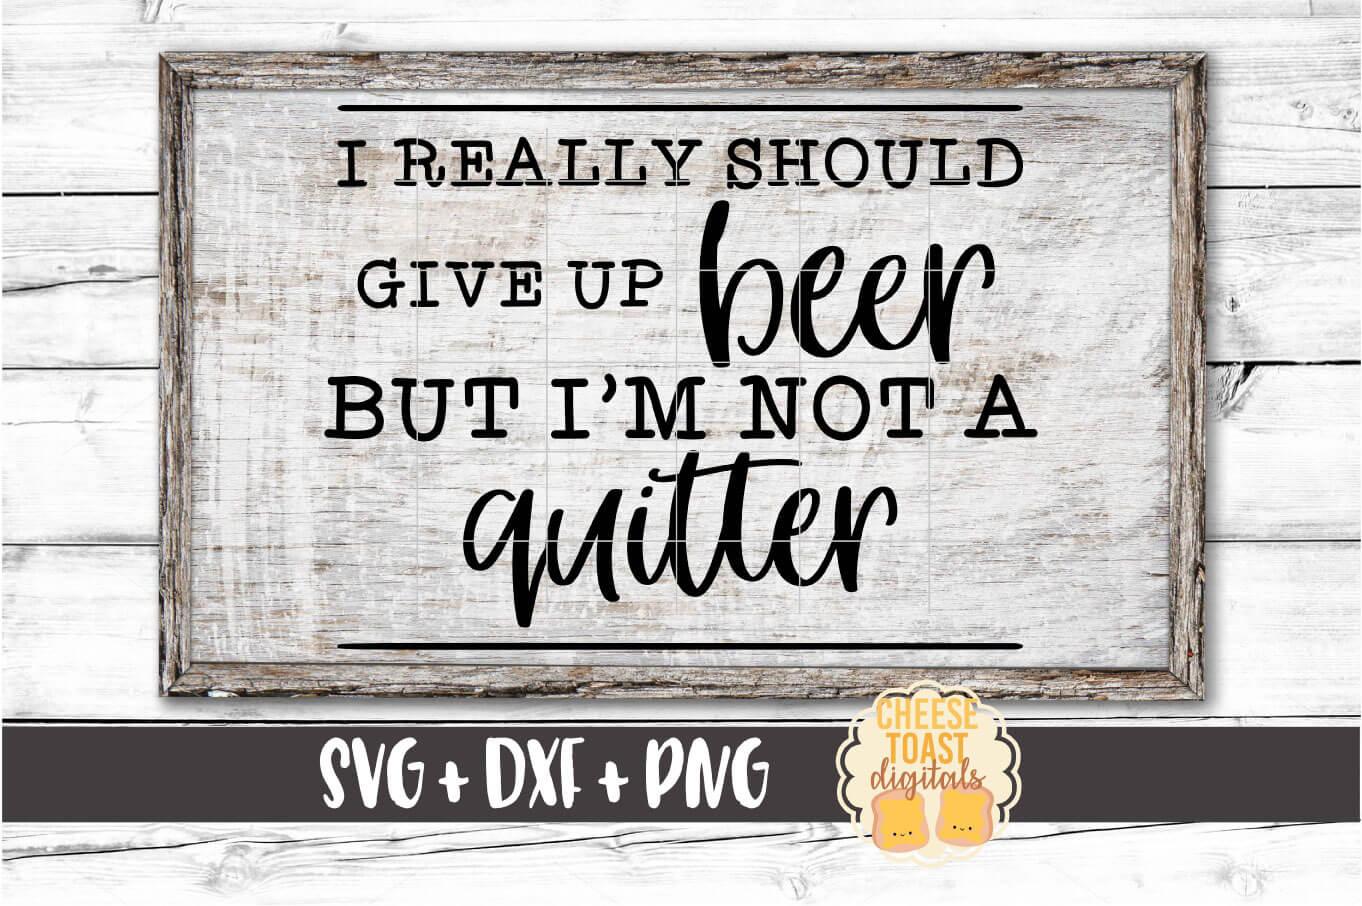 Beer Sign Bundle - 5 Designs SVG PNG DXF Cut Files example image 5